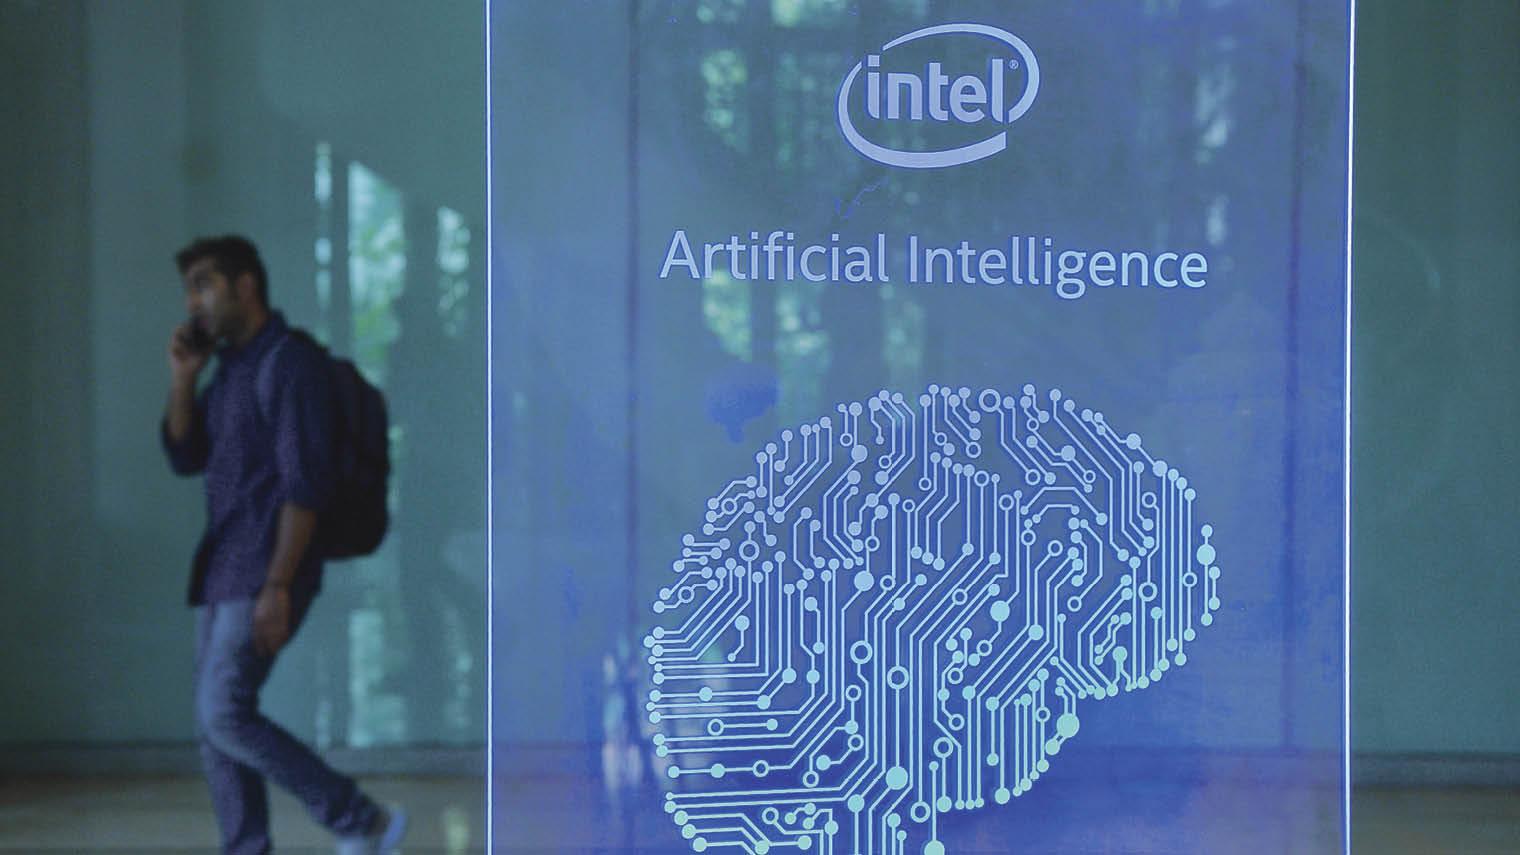 Intel last month spent $15.3 billion acquiring Mobileye, an Israeli chip maker for driverless cars